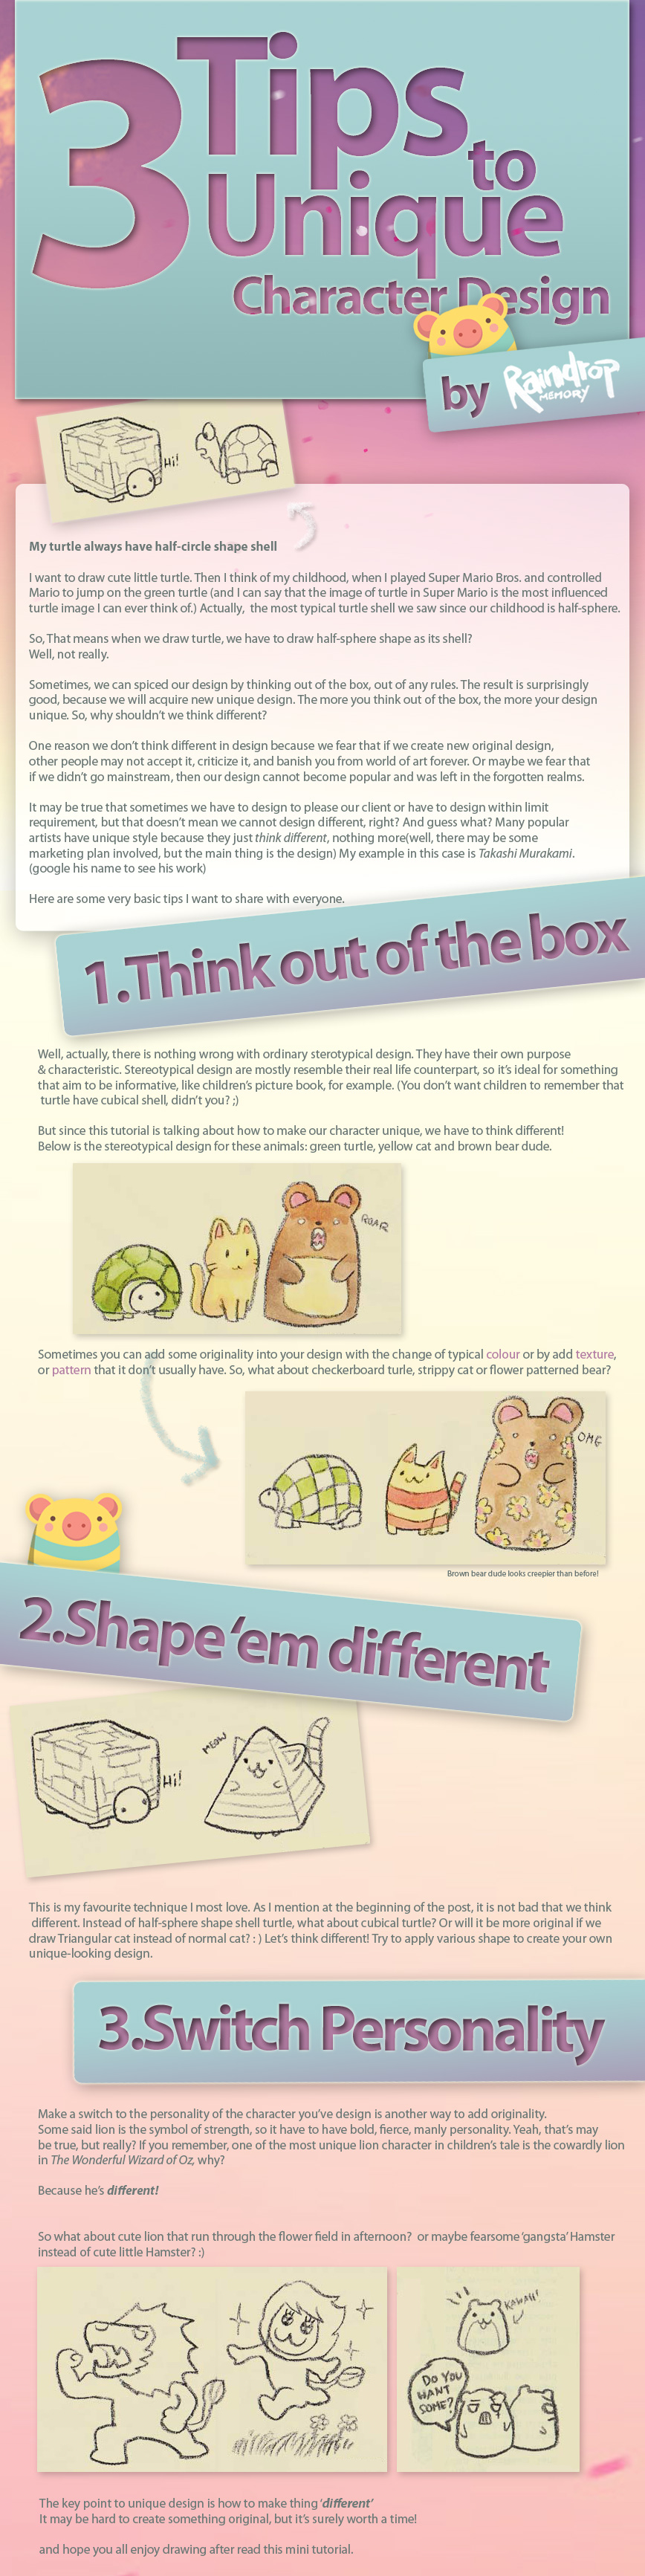 10 Character Design Tips : Tips to character design by raindropmemory on deviantart